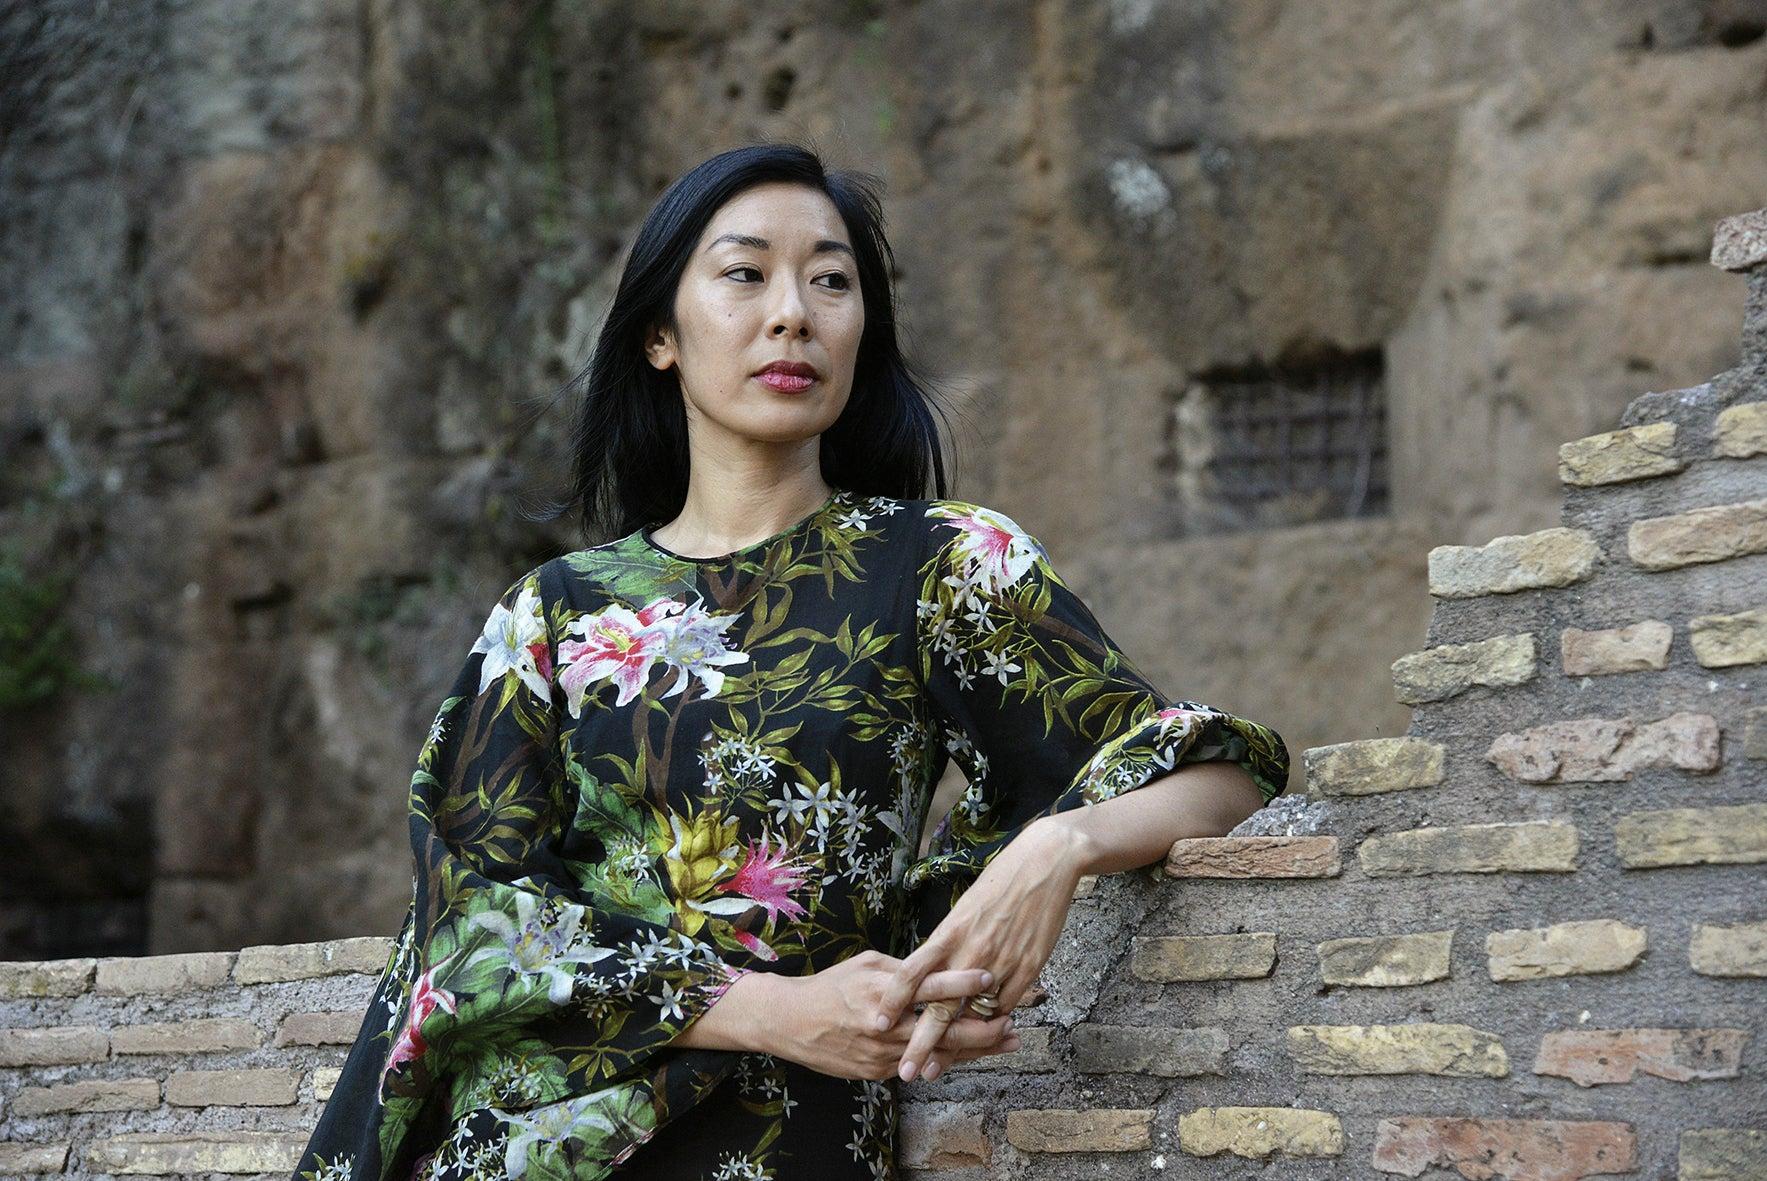 Katie Kitamura's Intimacies is an amorphous, disquieting novel